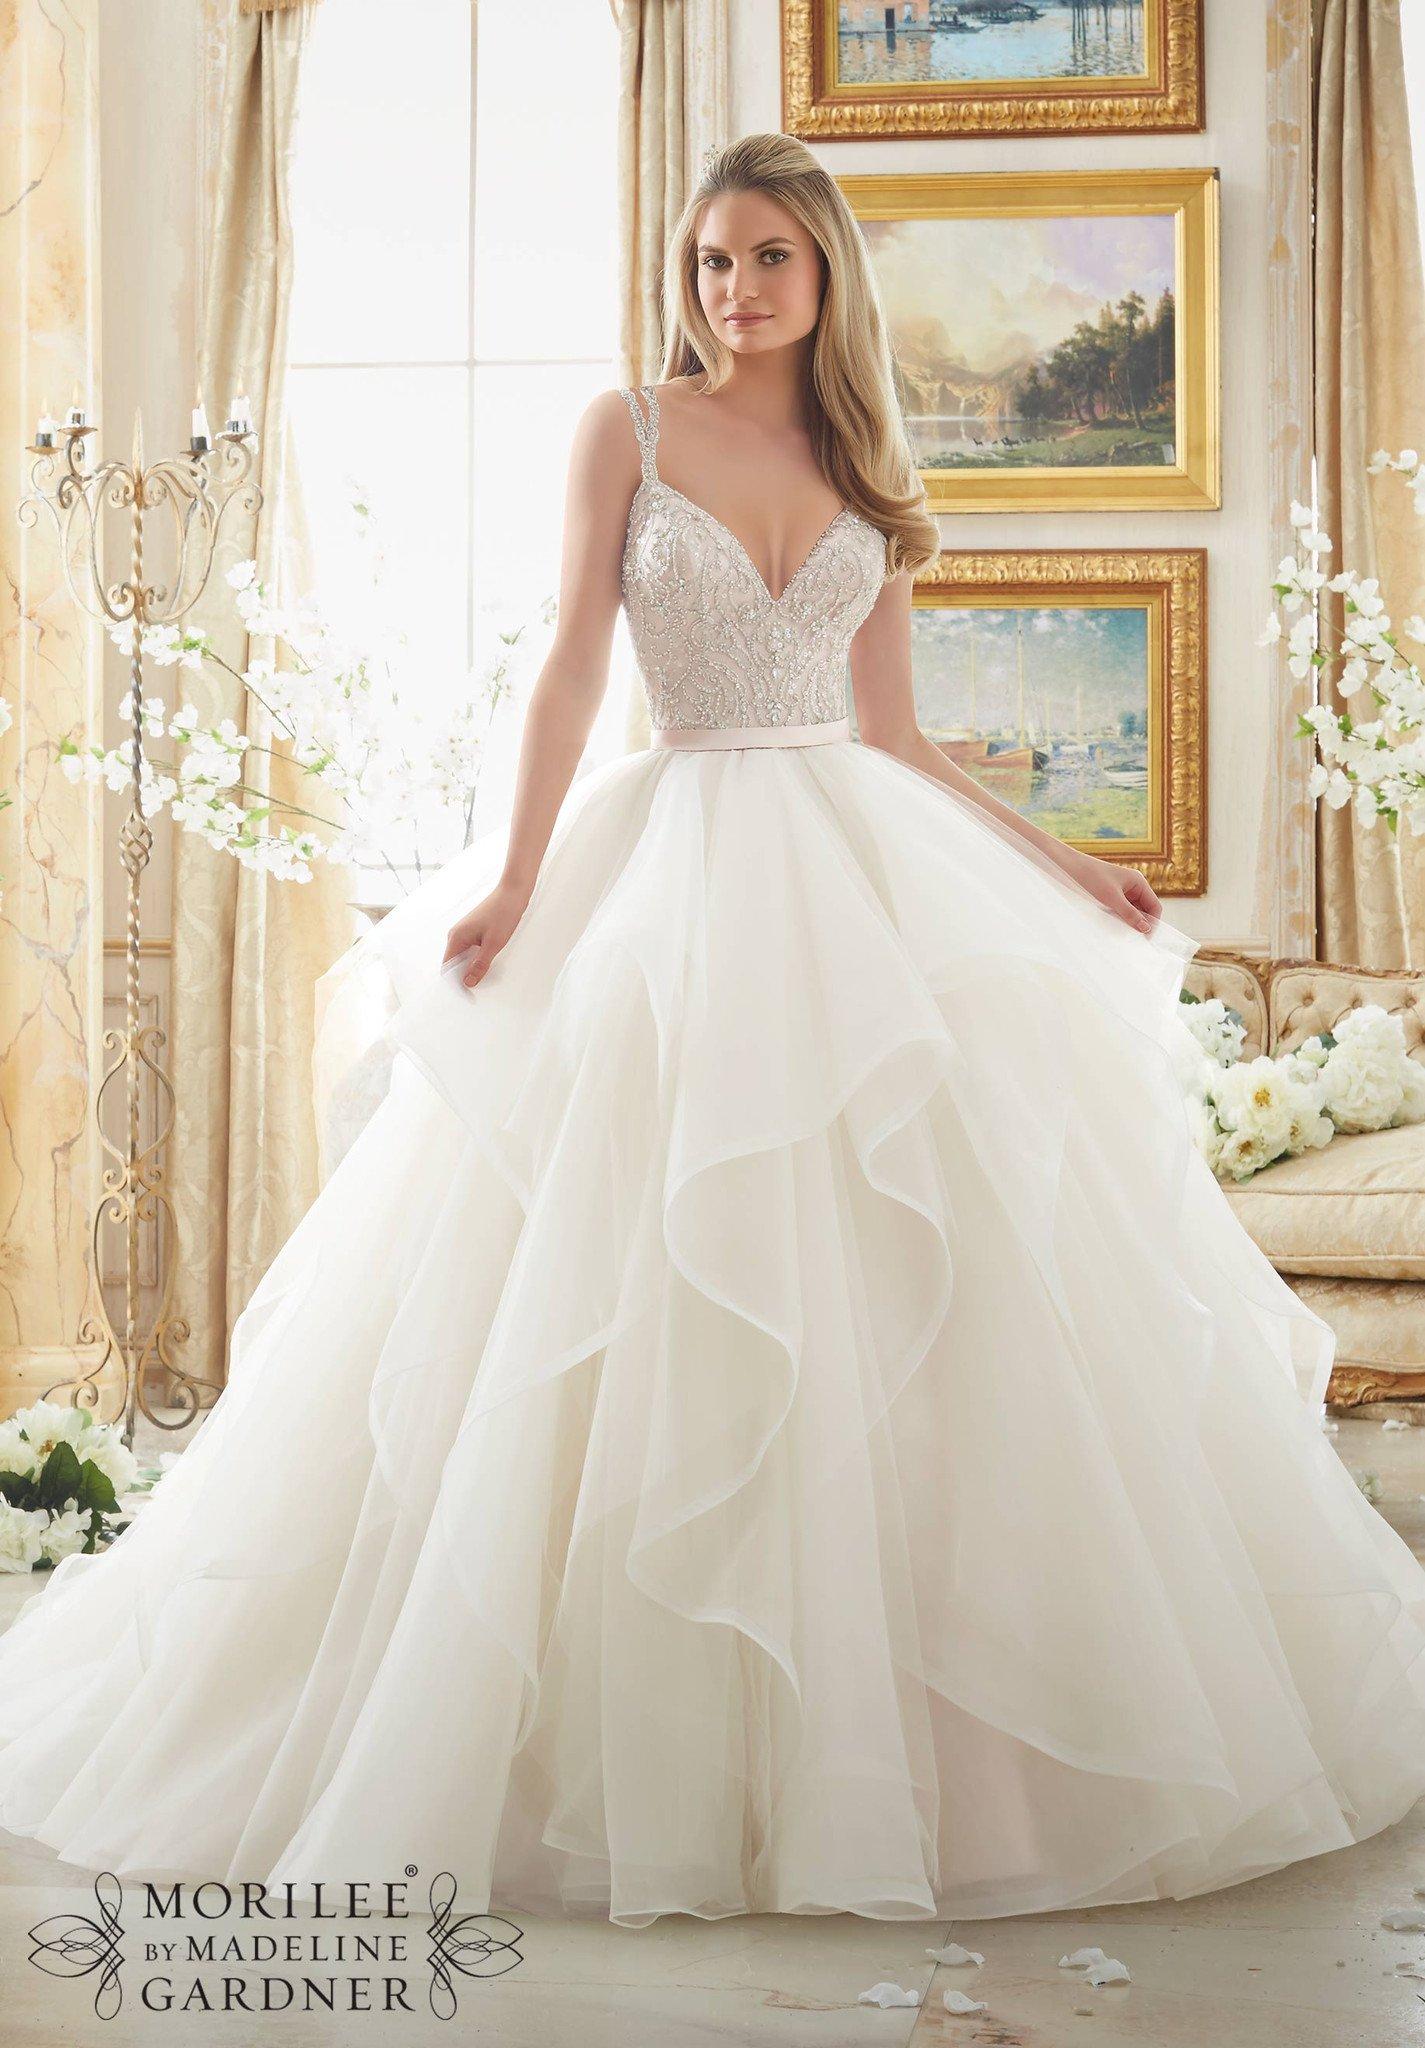 Photo of Mori Lee 2887 Beaded Bodice Flounced Tulle Ball Gown Wedding Dress